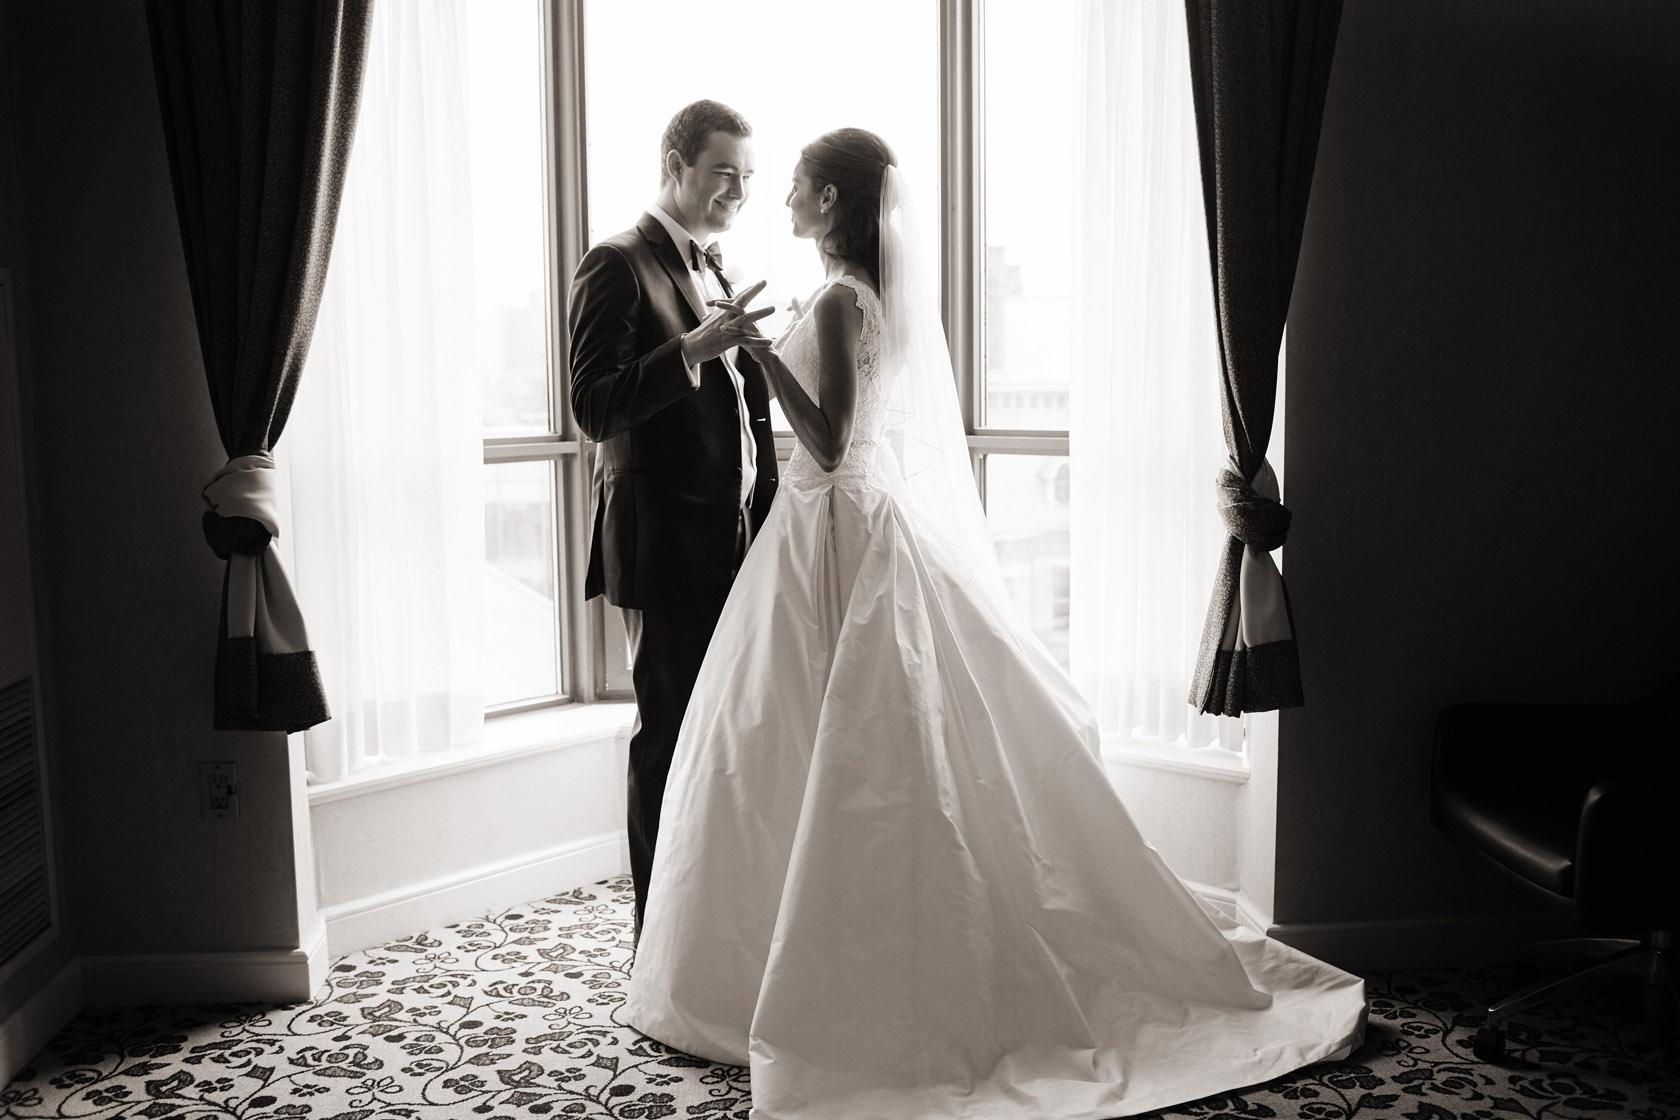 stephen sager photography 2006 toronto wedding photography